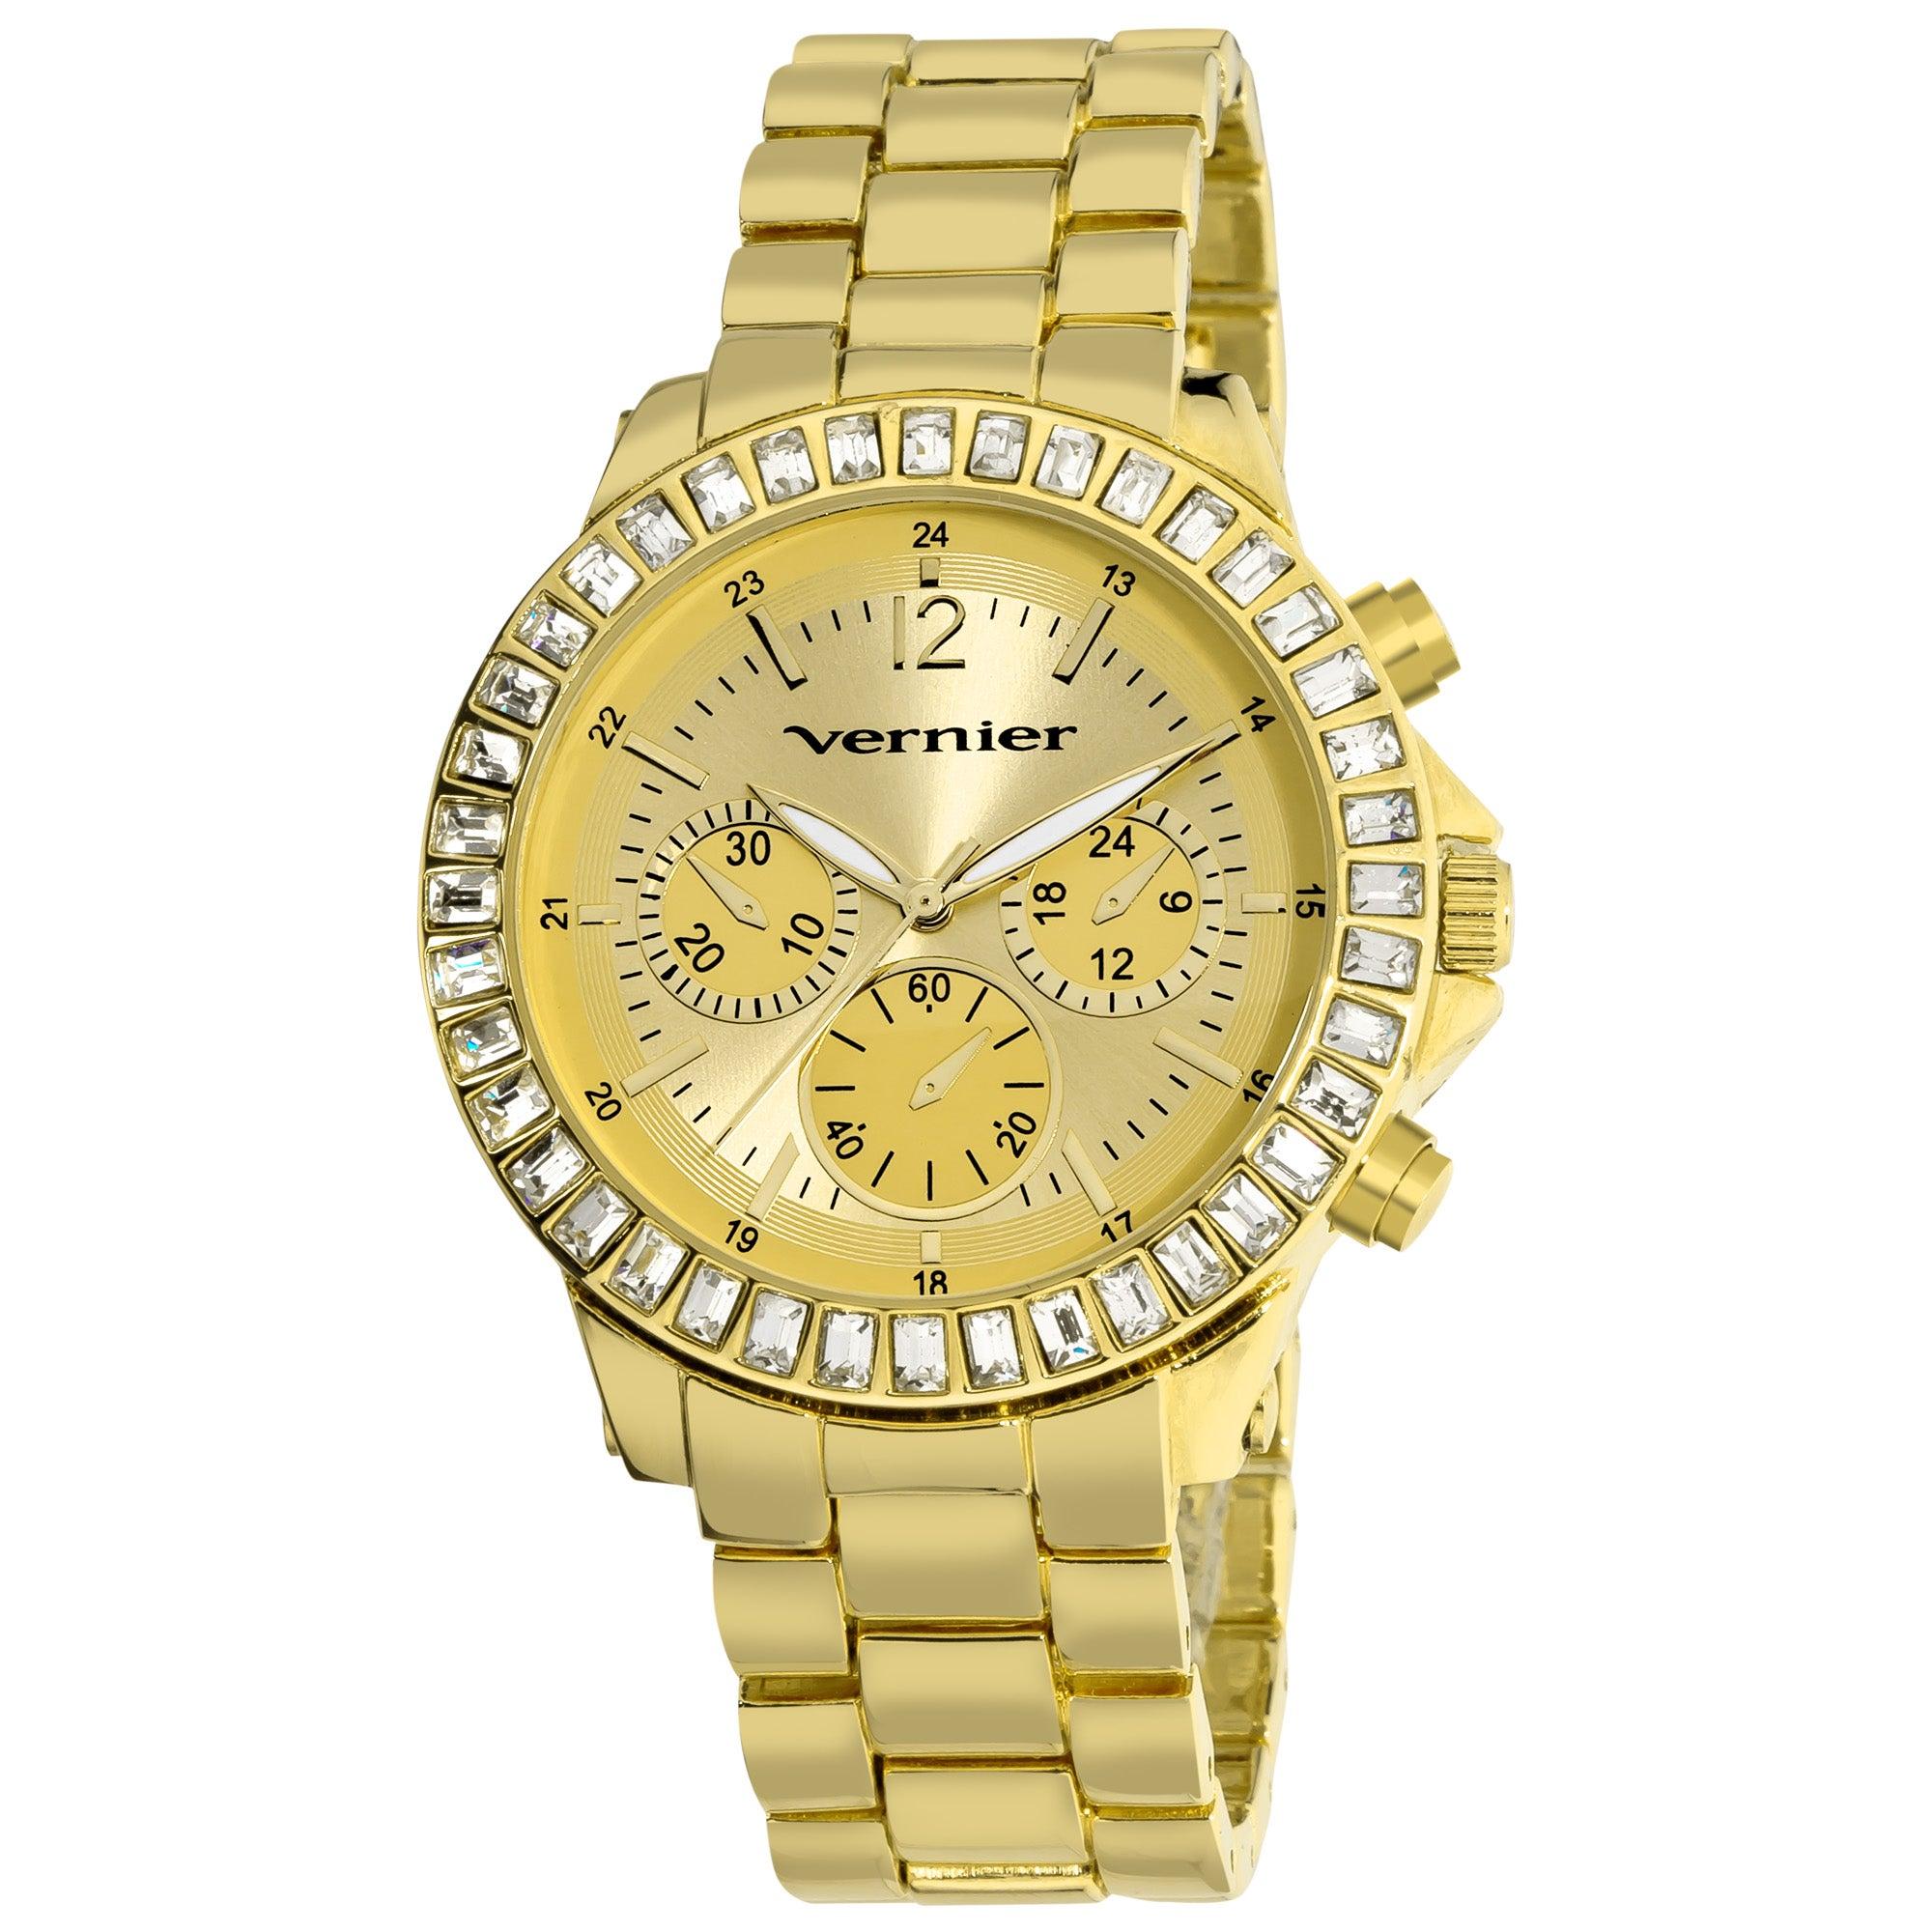 Vernier Women's Large Gold Tone Chrono-Look Dial Dual Time Watch